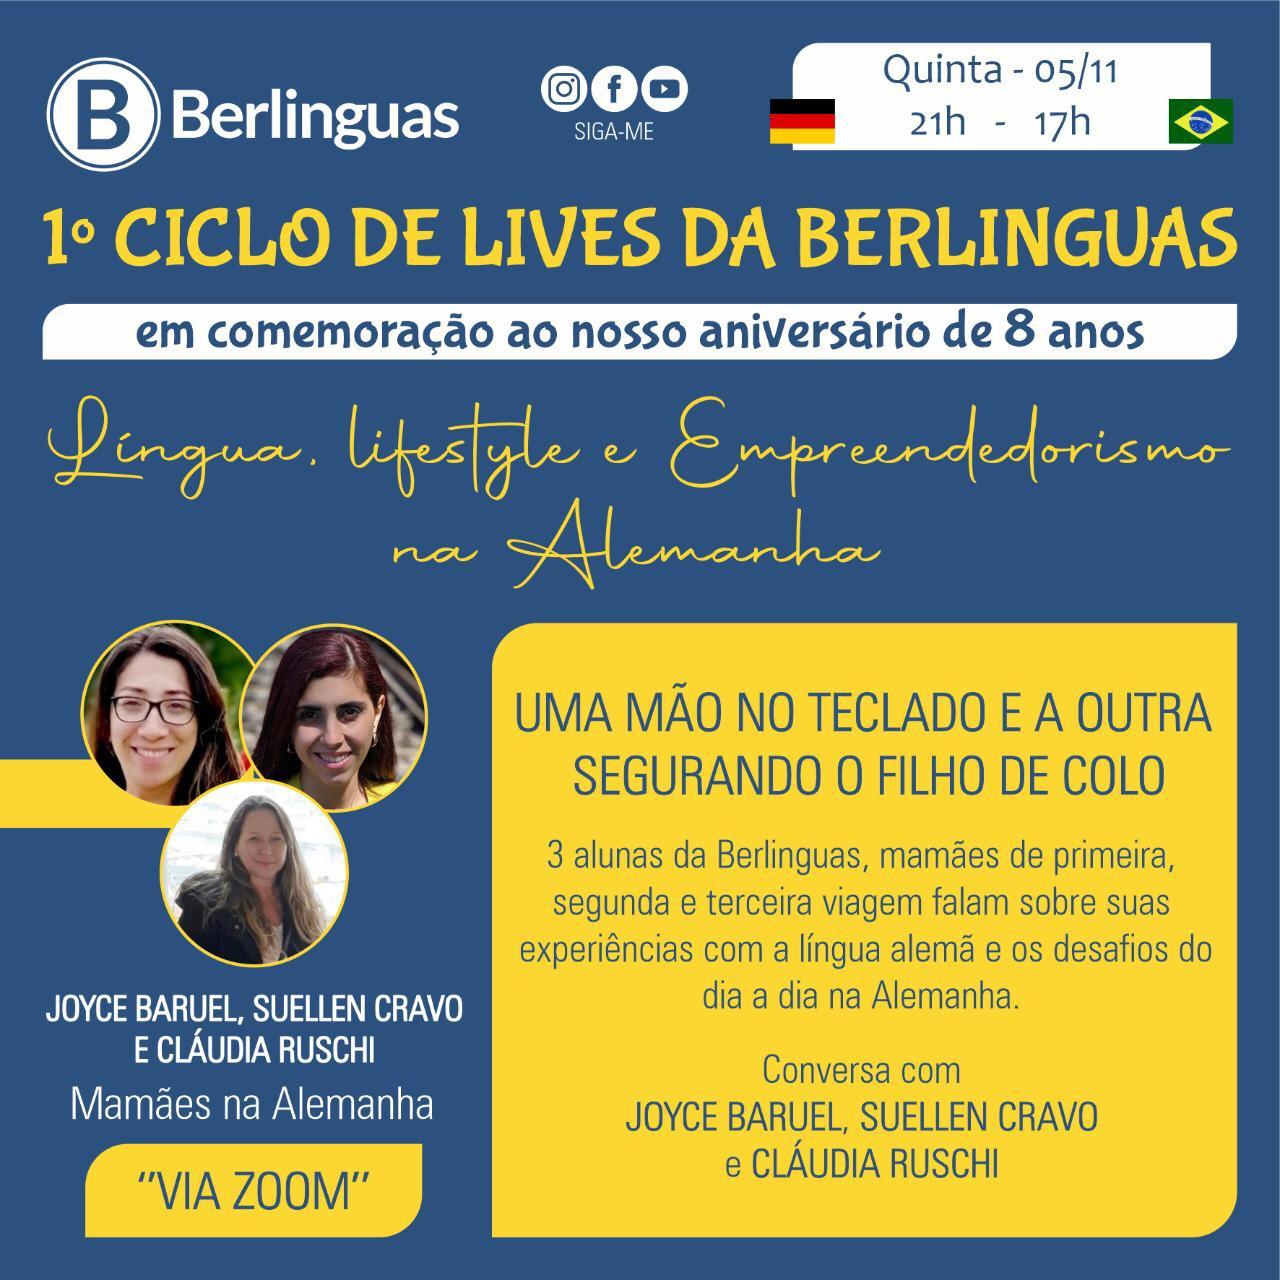 1-ciclo-de-lives-da-berlinguas-joyce-baruell-suellen-cravo-claudia-ruschi